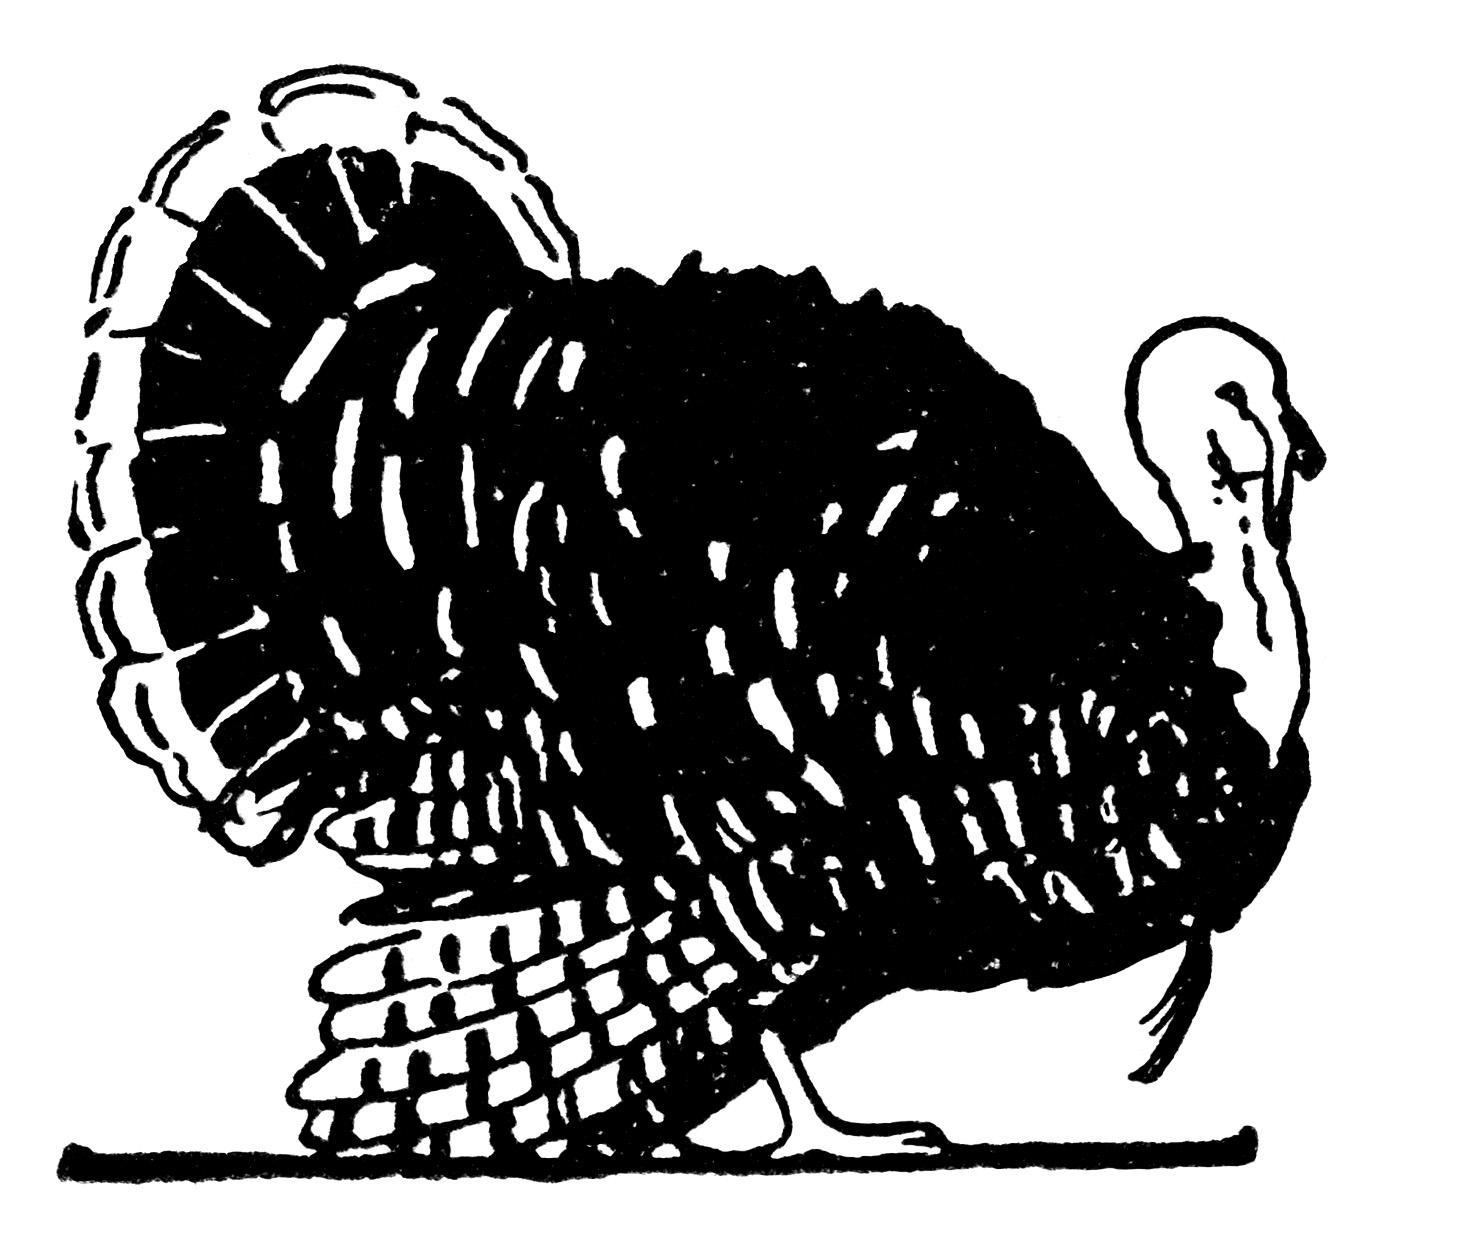 Free Vintage Turkey Clip Art (black and white version).